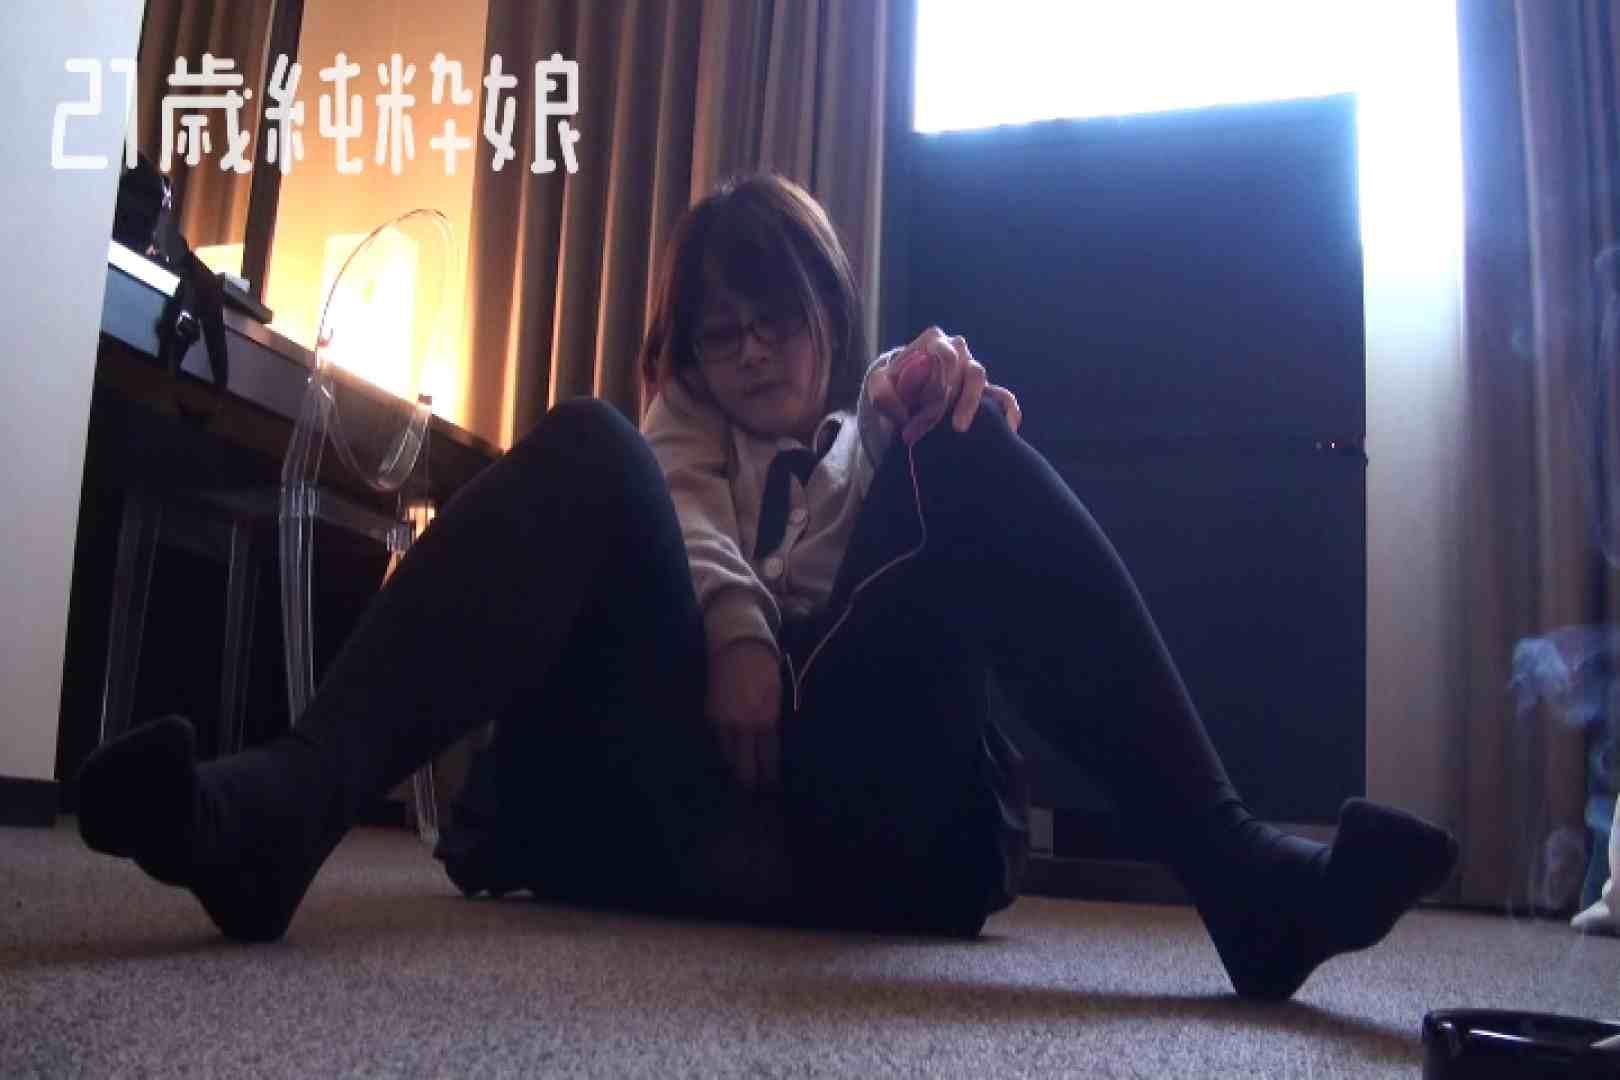 Gカップ21歳純粋嬢第2弾Vol.3 性欲 盗撮動画紹介 71pic 11